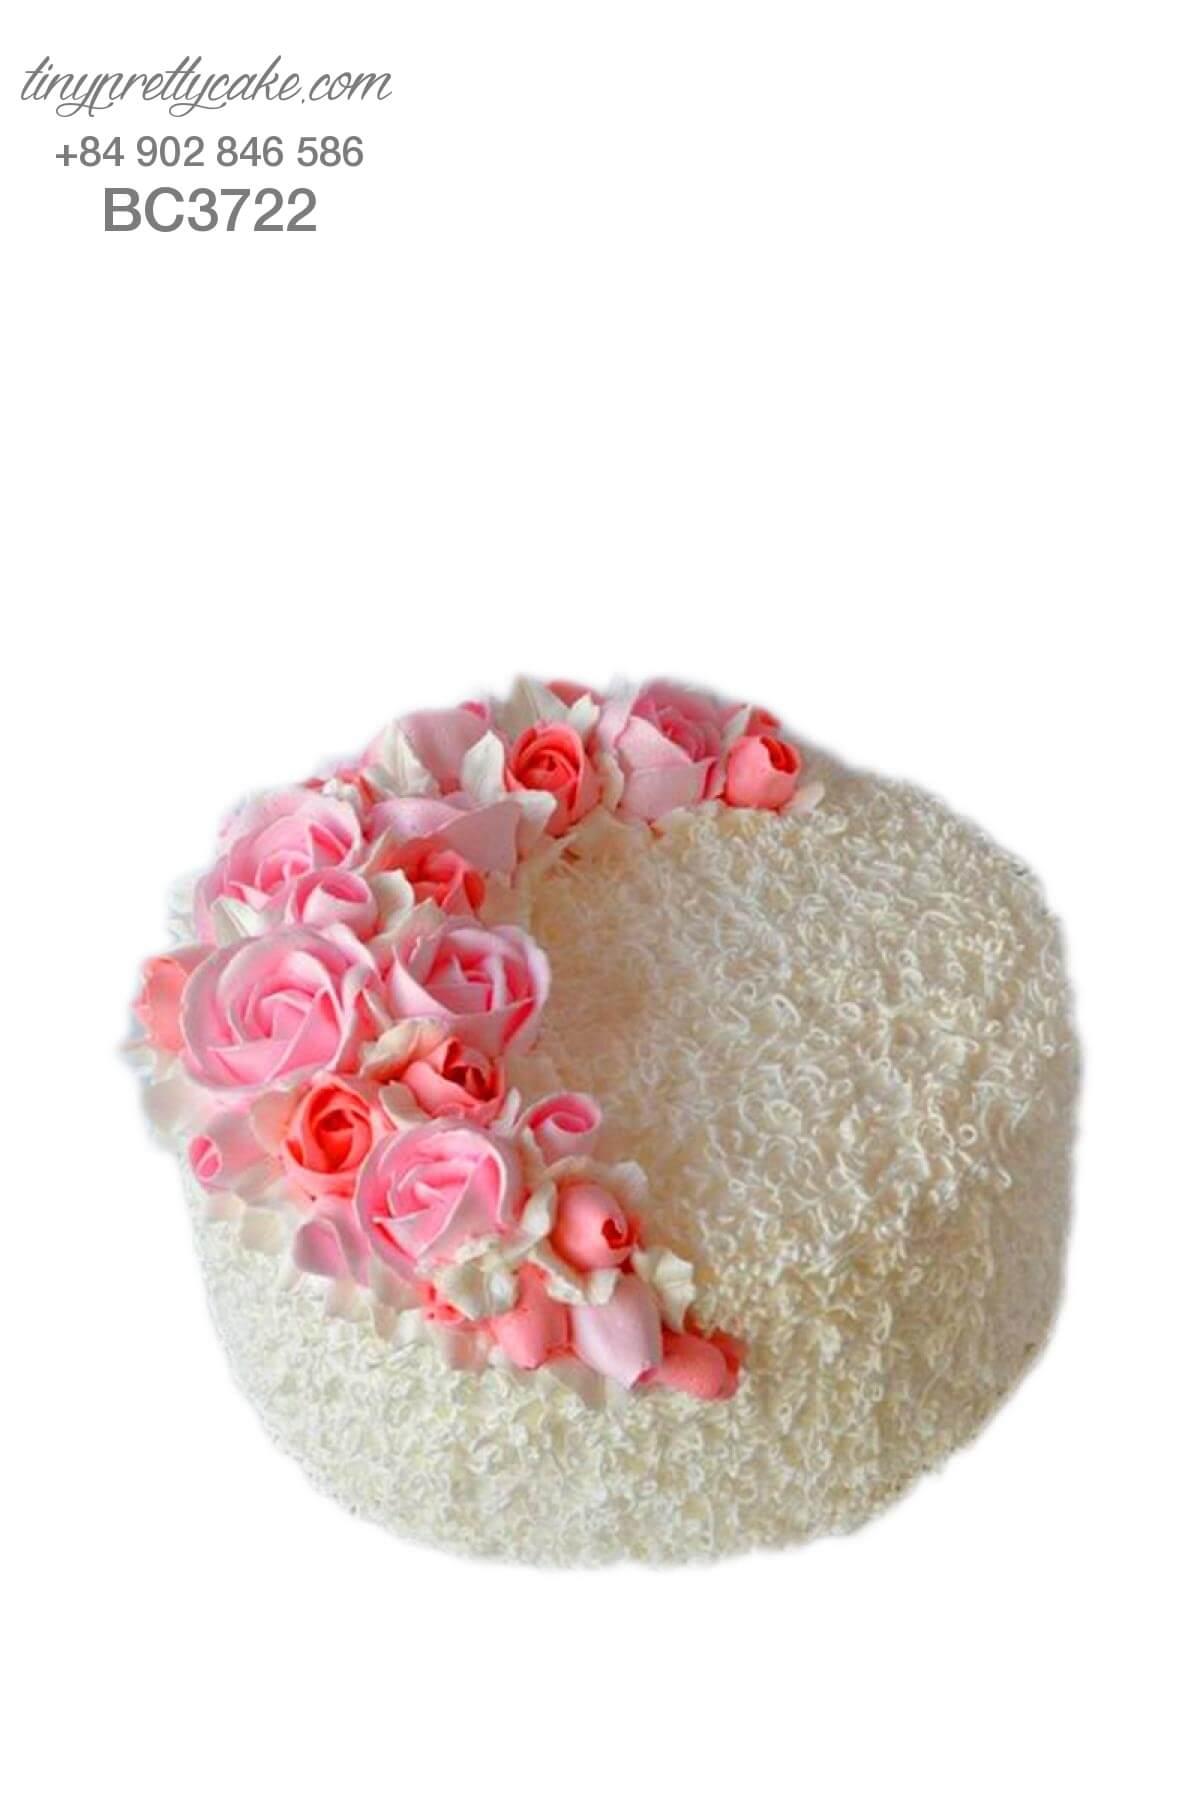 Bánh kem hoa hồng đẹp